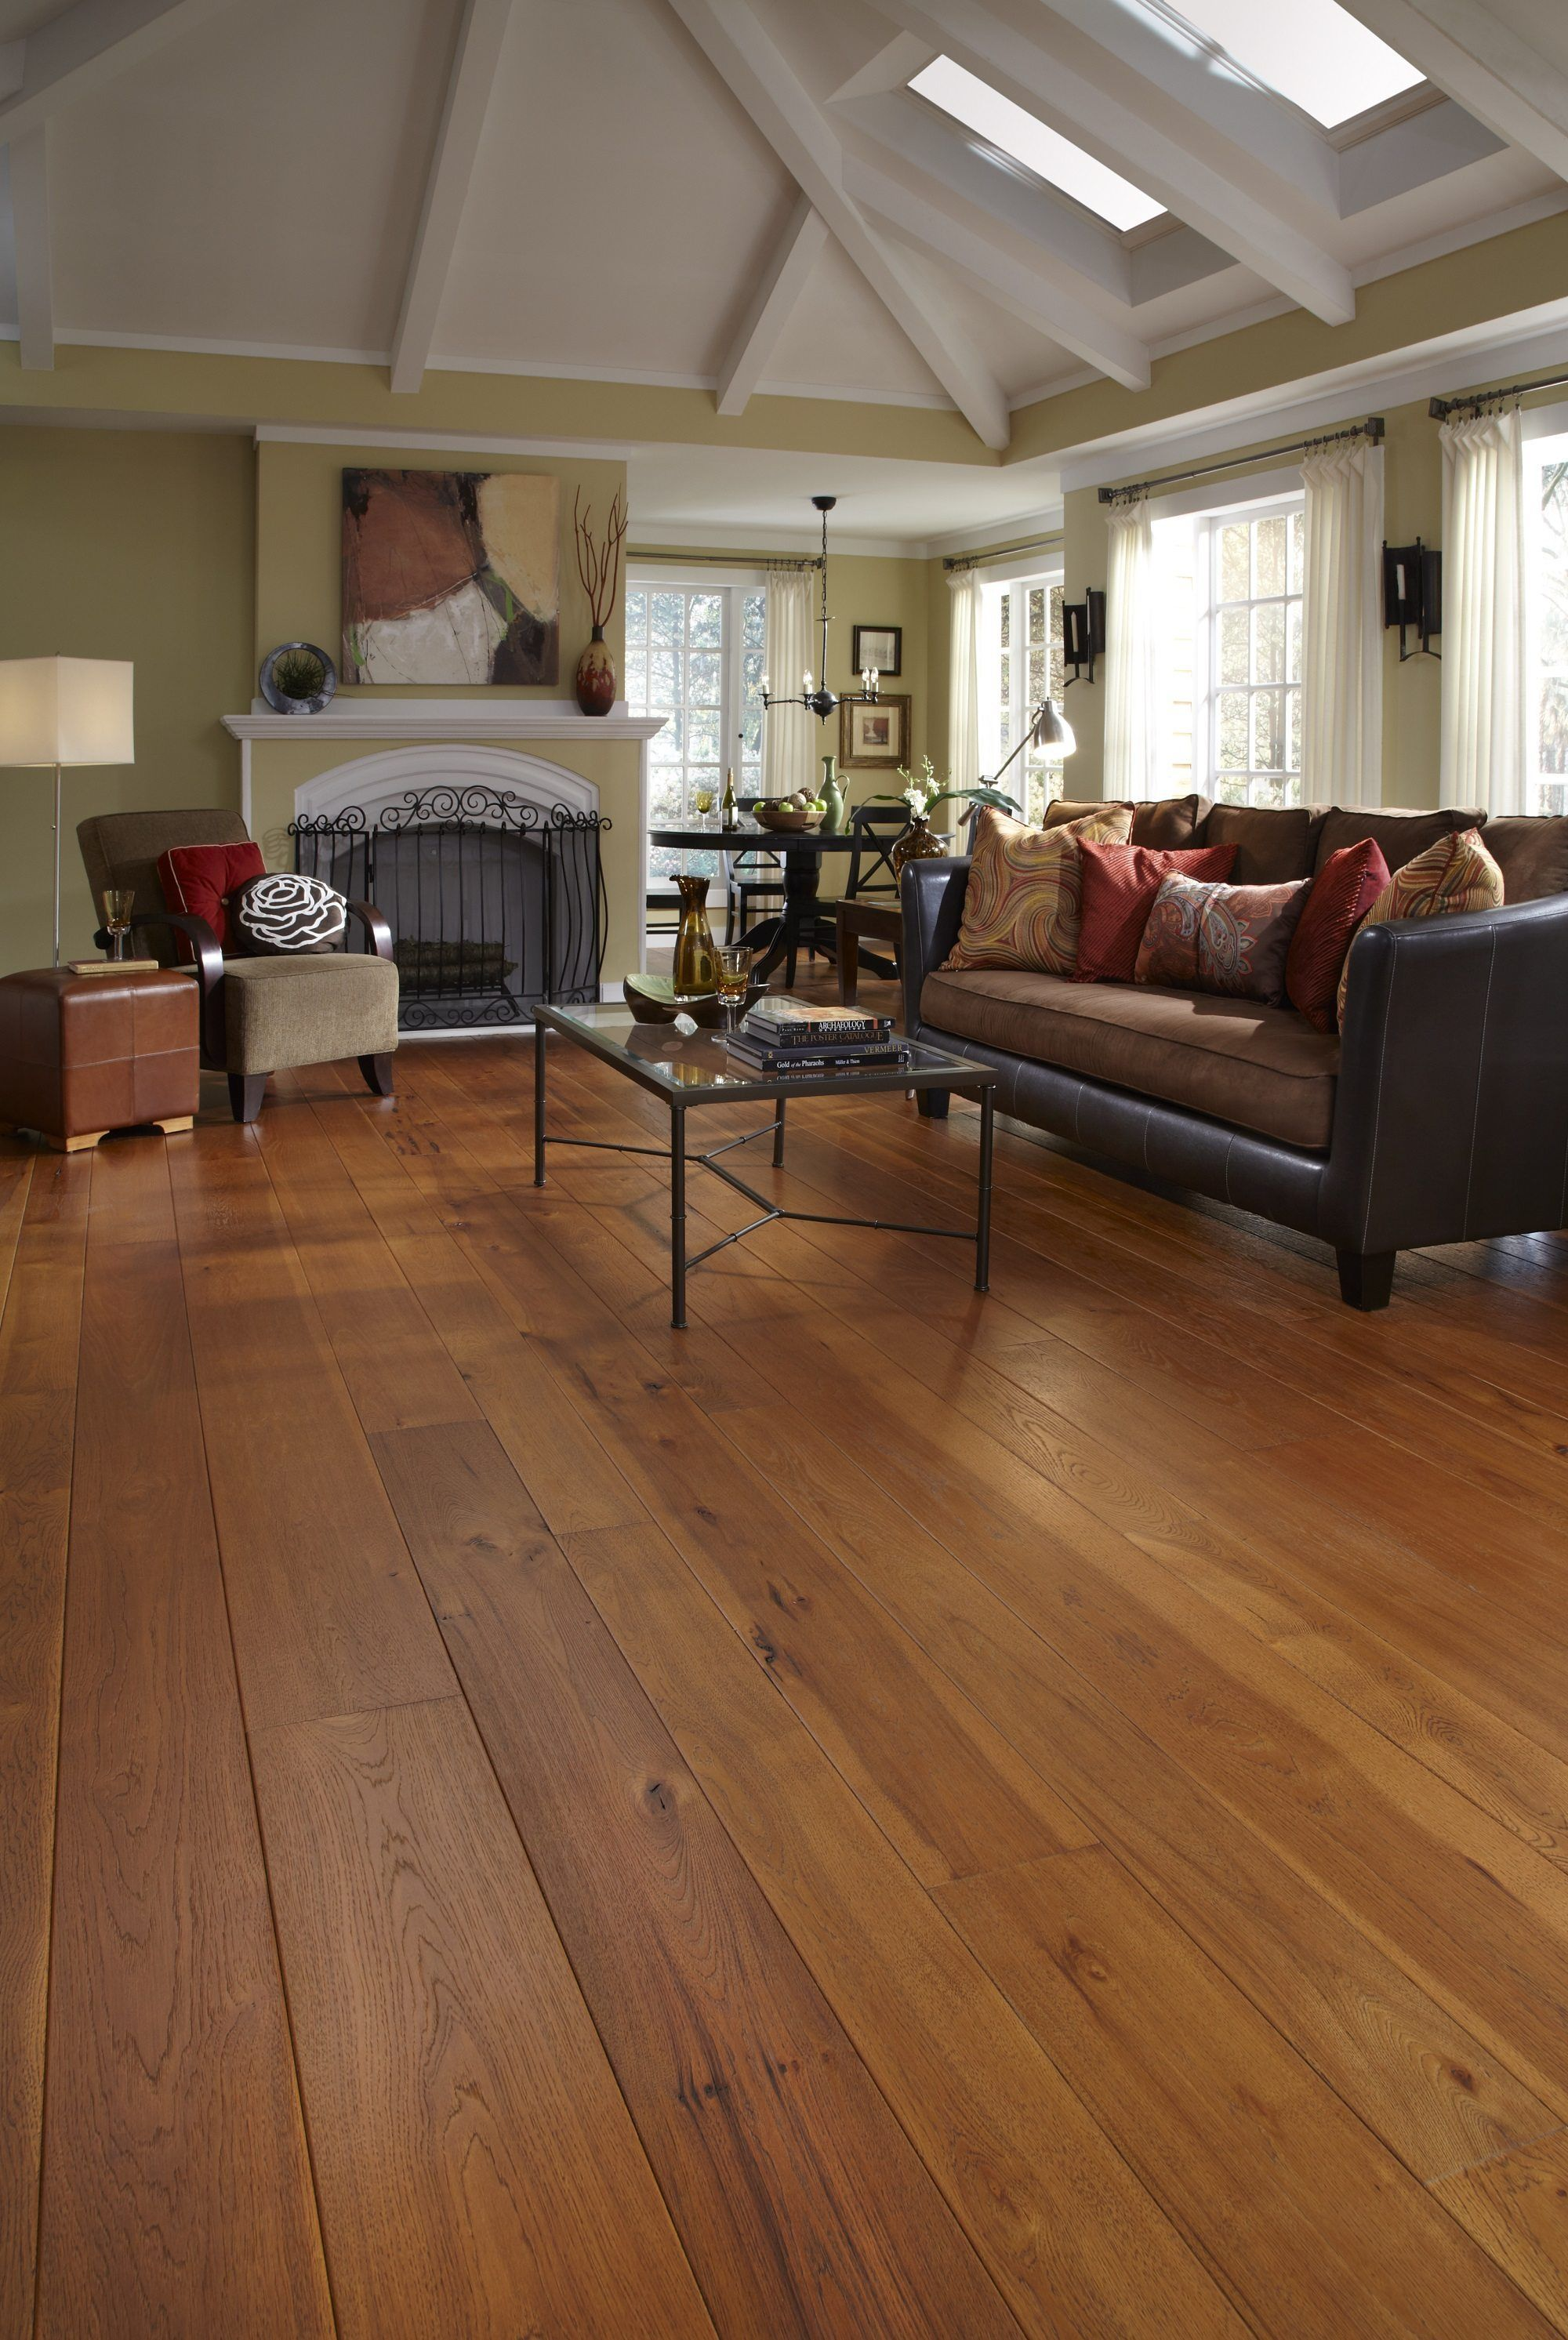 Carlisle Wide Plank Floors Hickory Hardwood Flooring In Living Room